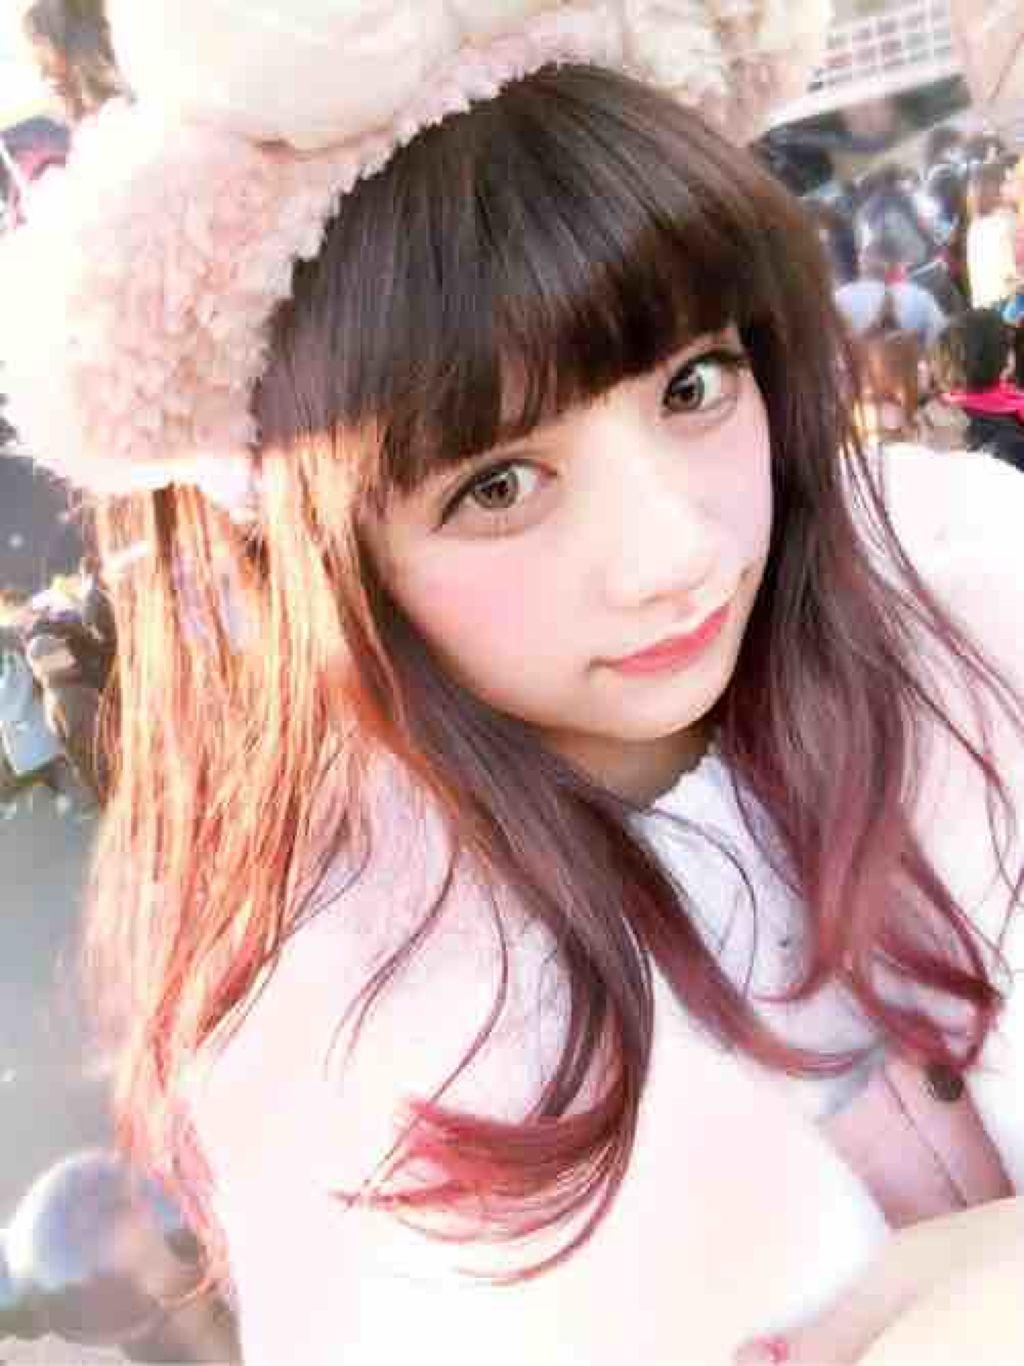 twinkle_blush_ndm